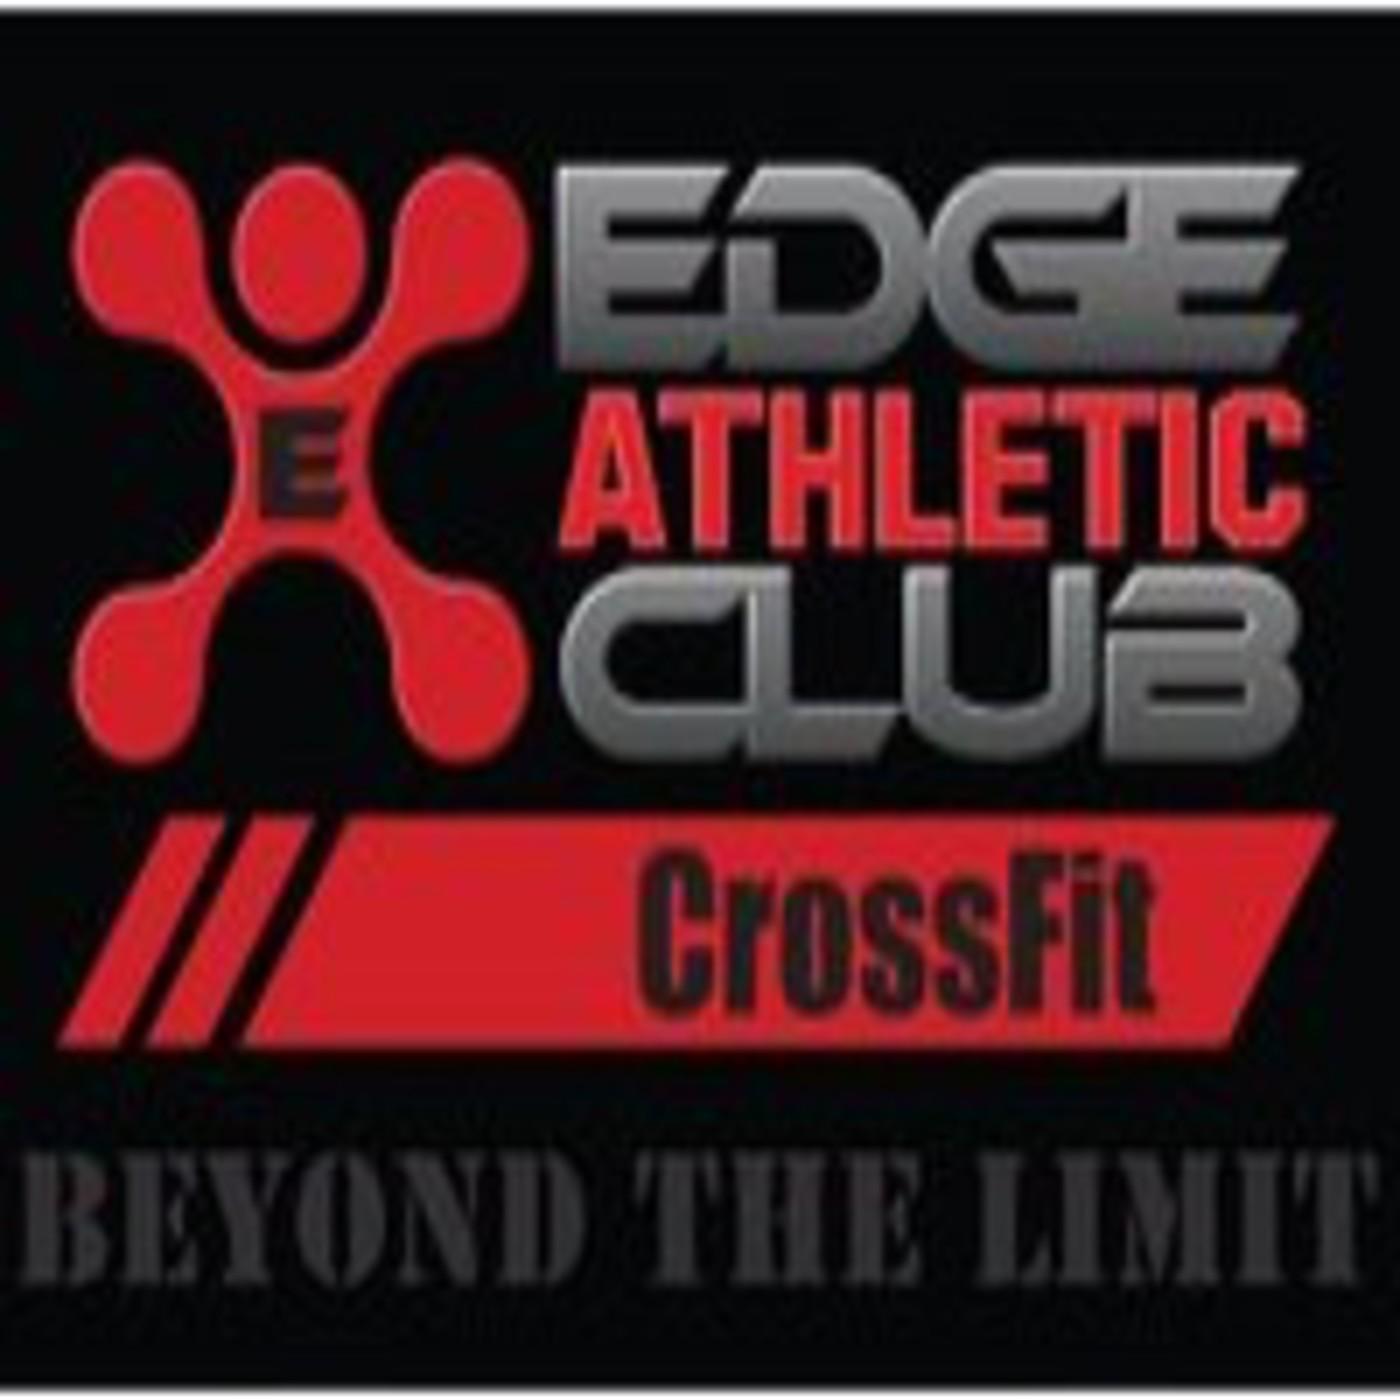 <![CDATA[EDGE Athletic Club CrossFit]]>